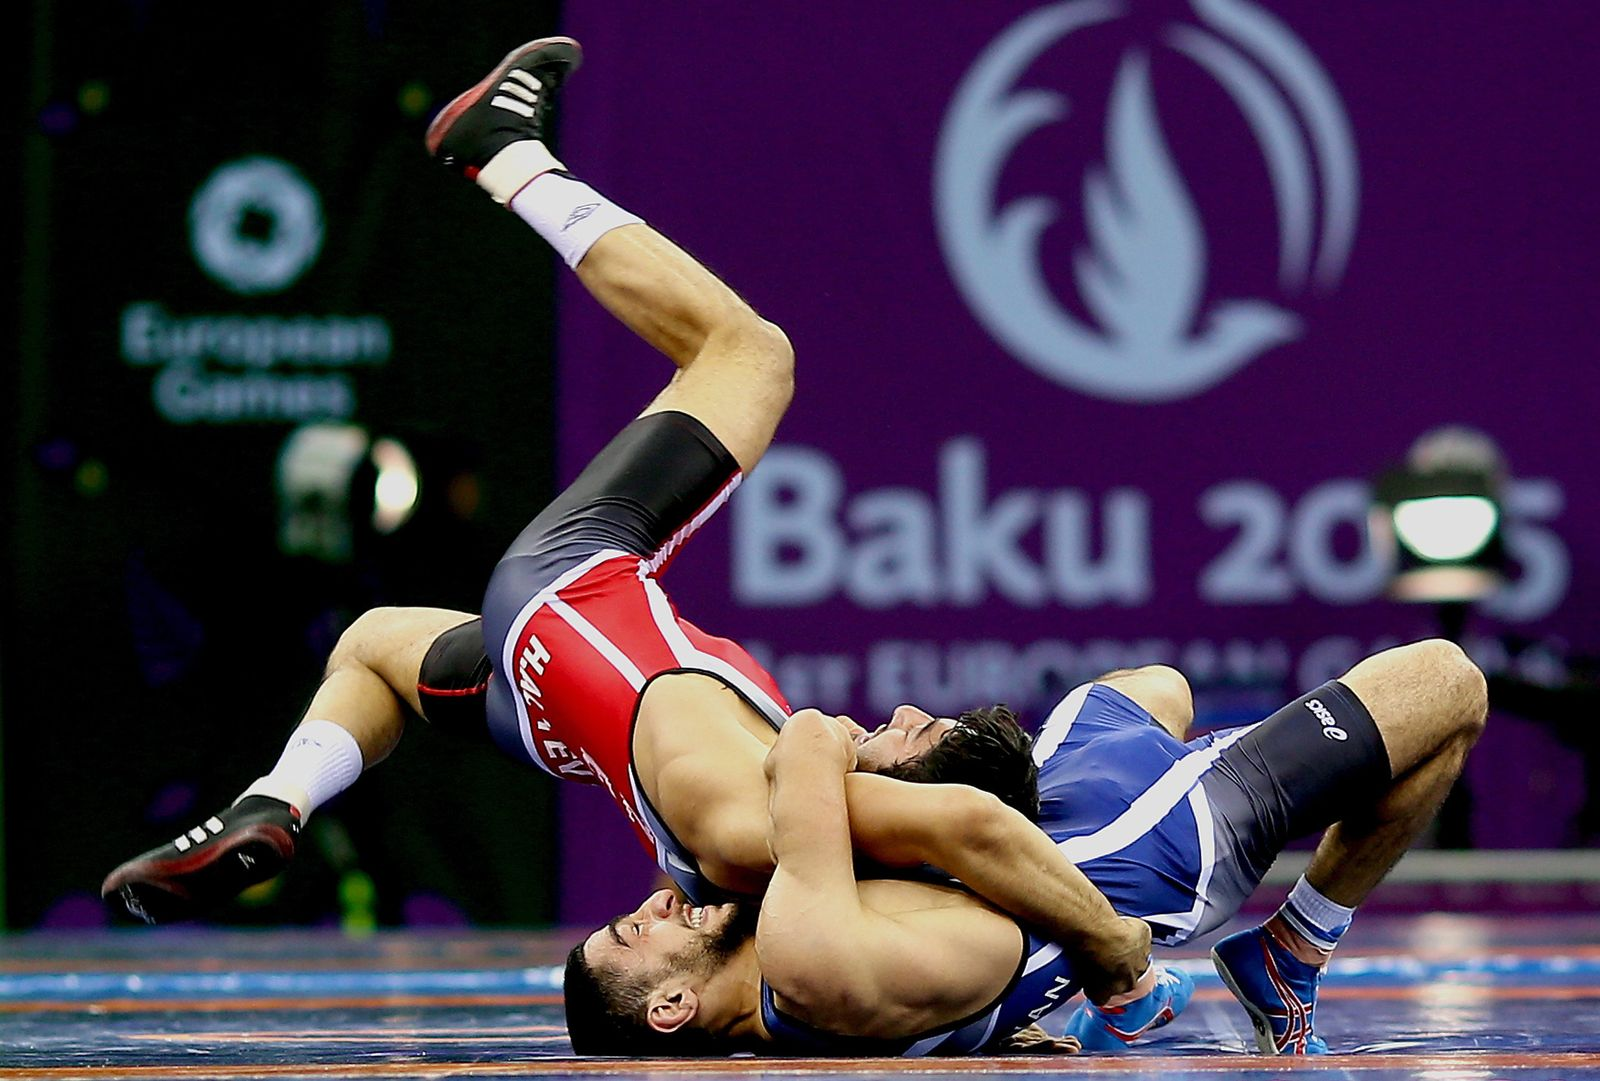 Baku 2015 European Games - Greco-Roman wrestling